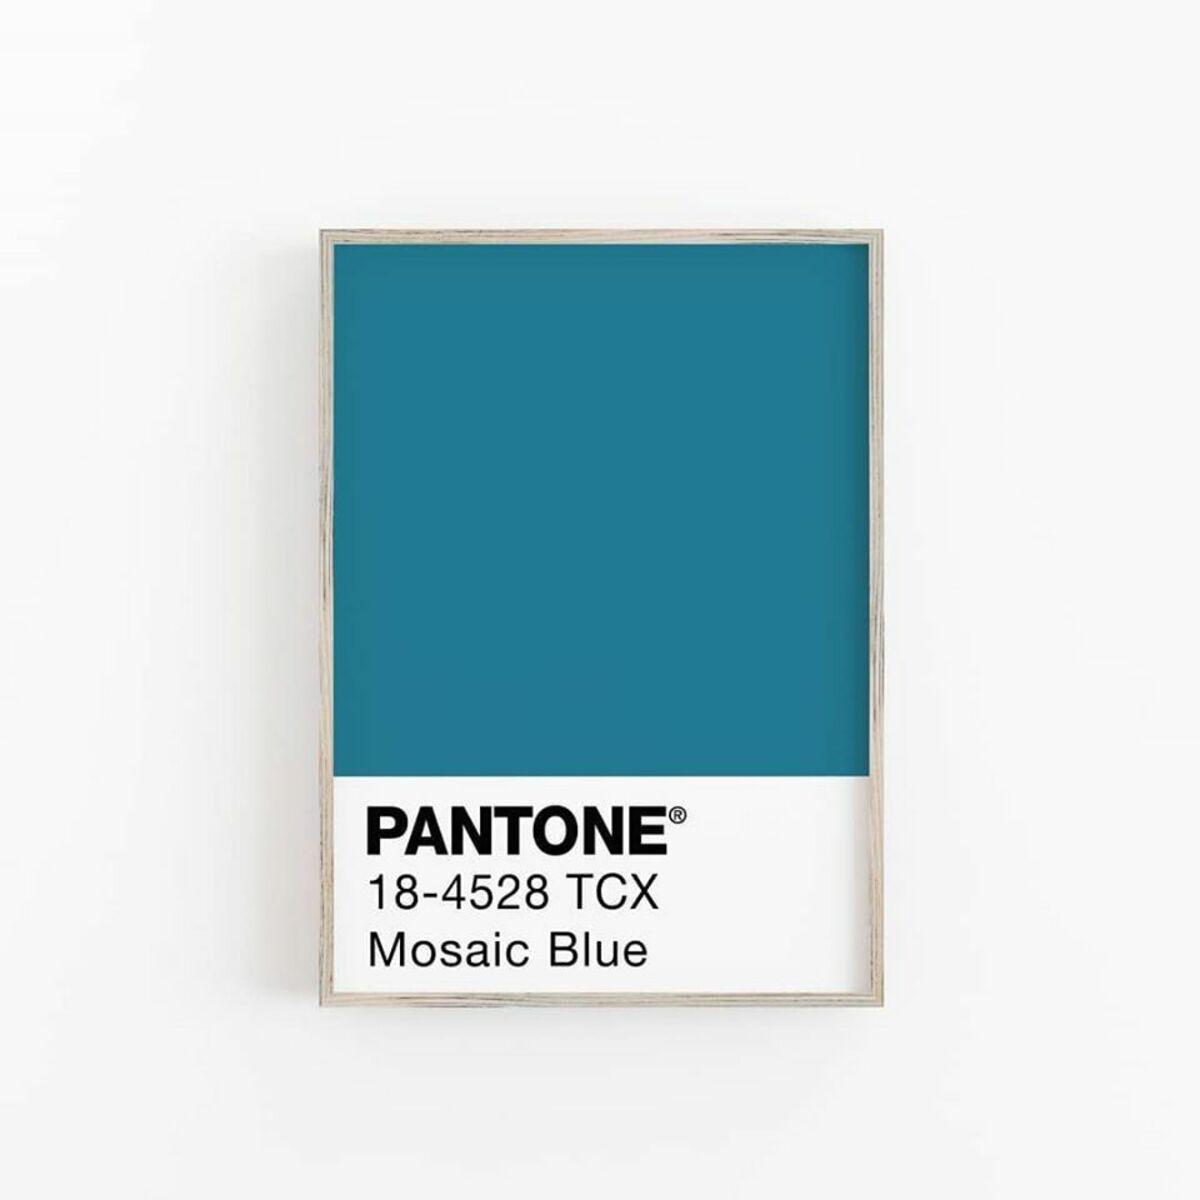 Mosaic Blue Pantone